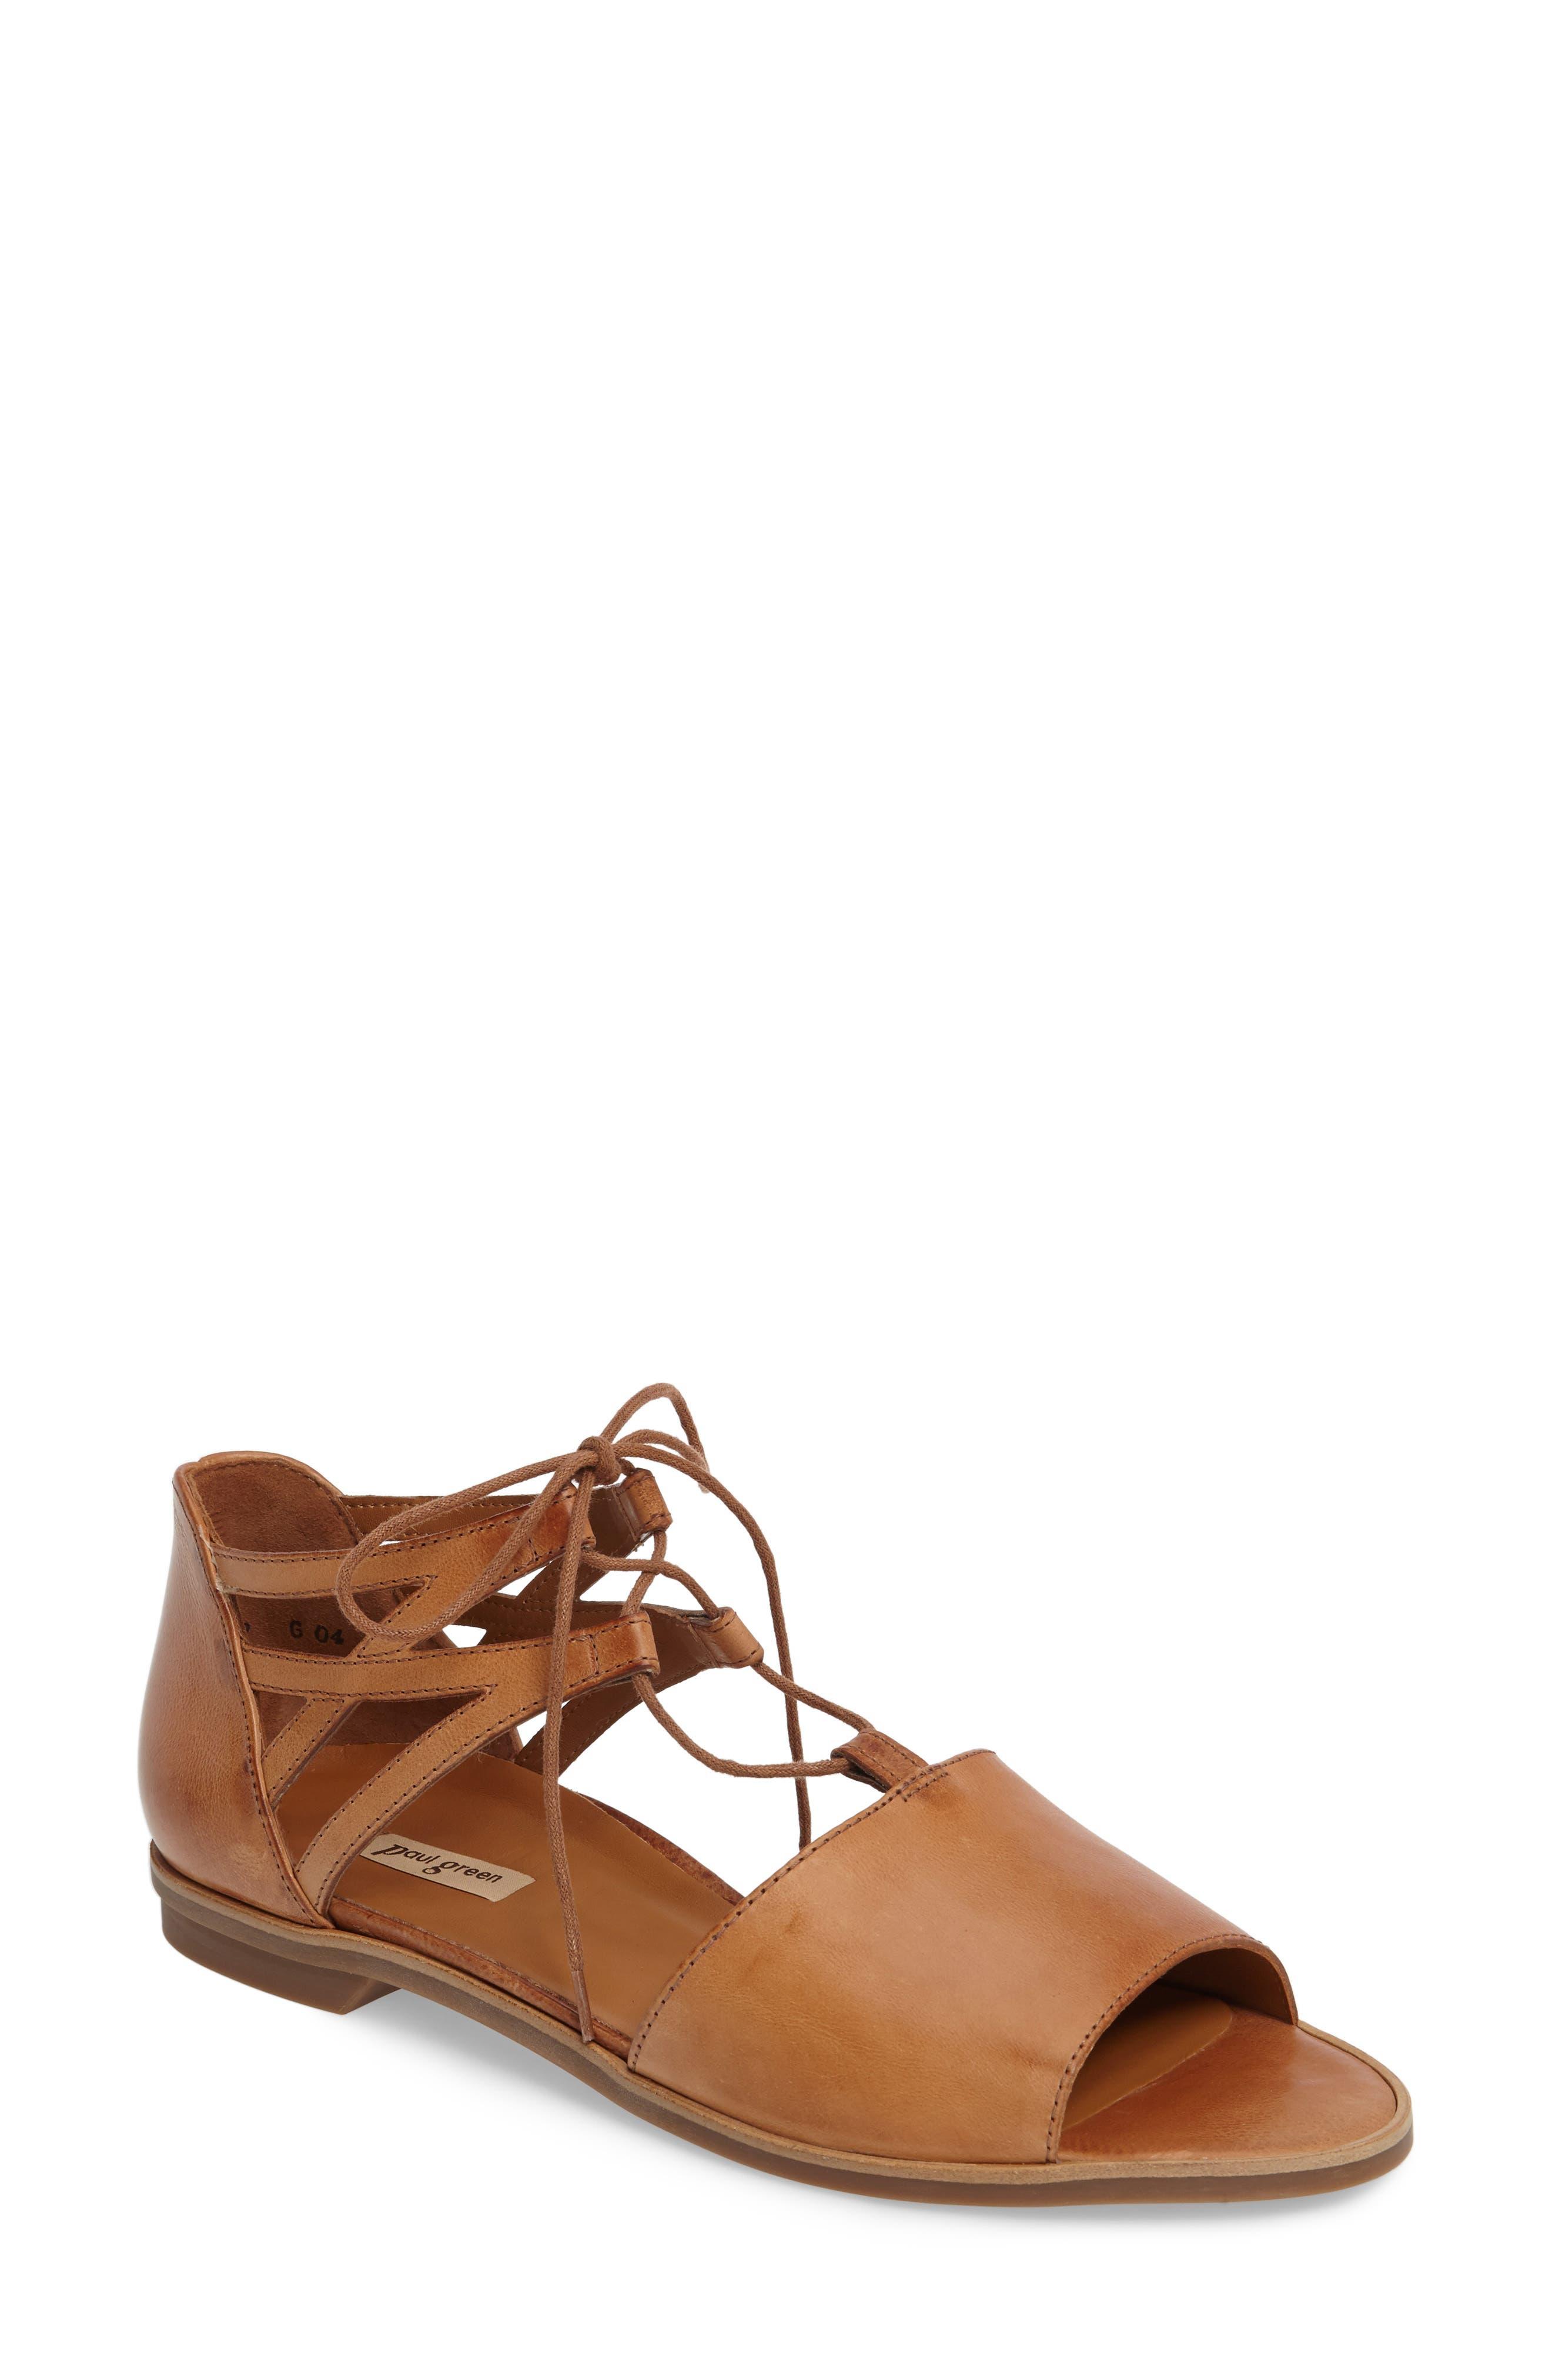 Alternate Image 1 Selected - Paul Green Morea Lace-Up Sandal (Women)